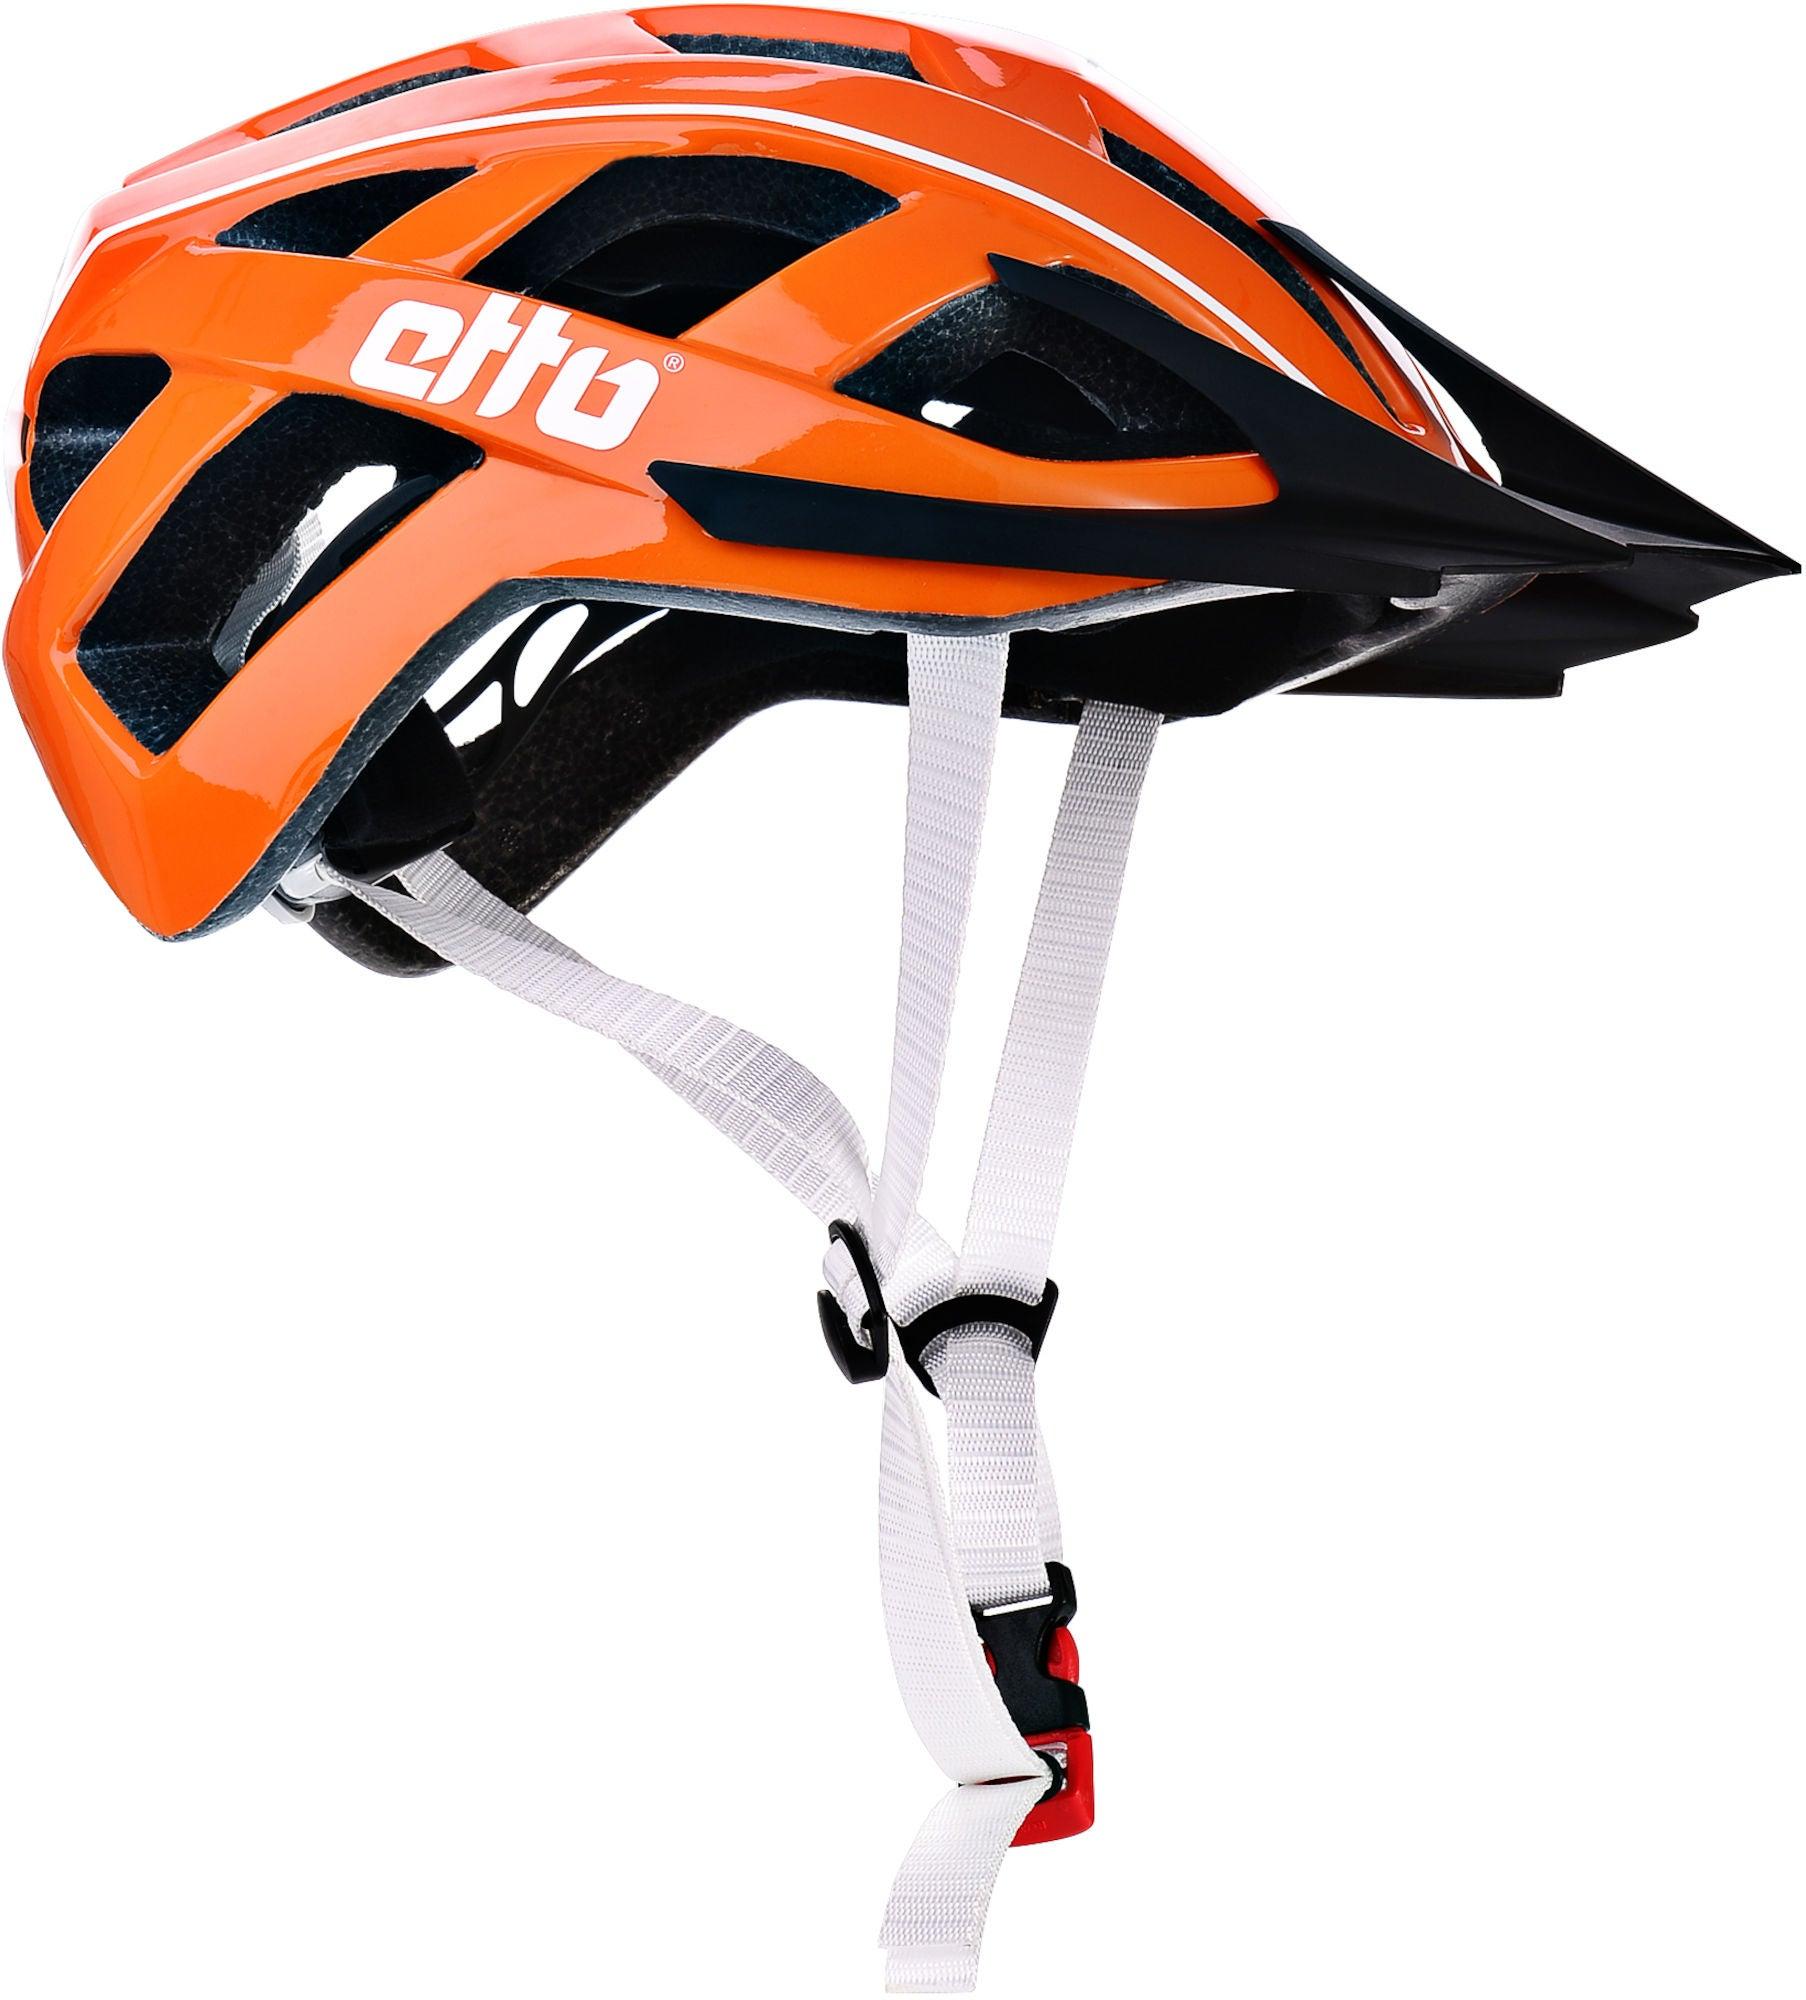 Etto Champery Jr MIPS Cykelhjelm, Orange/White | Helmets